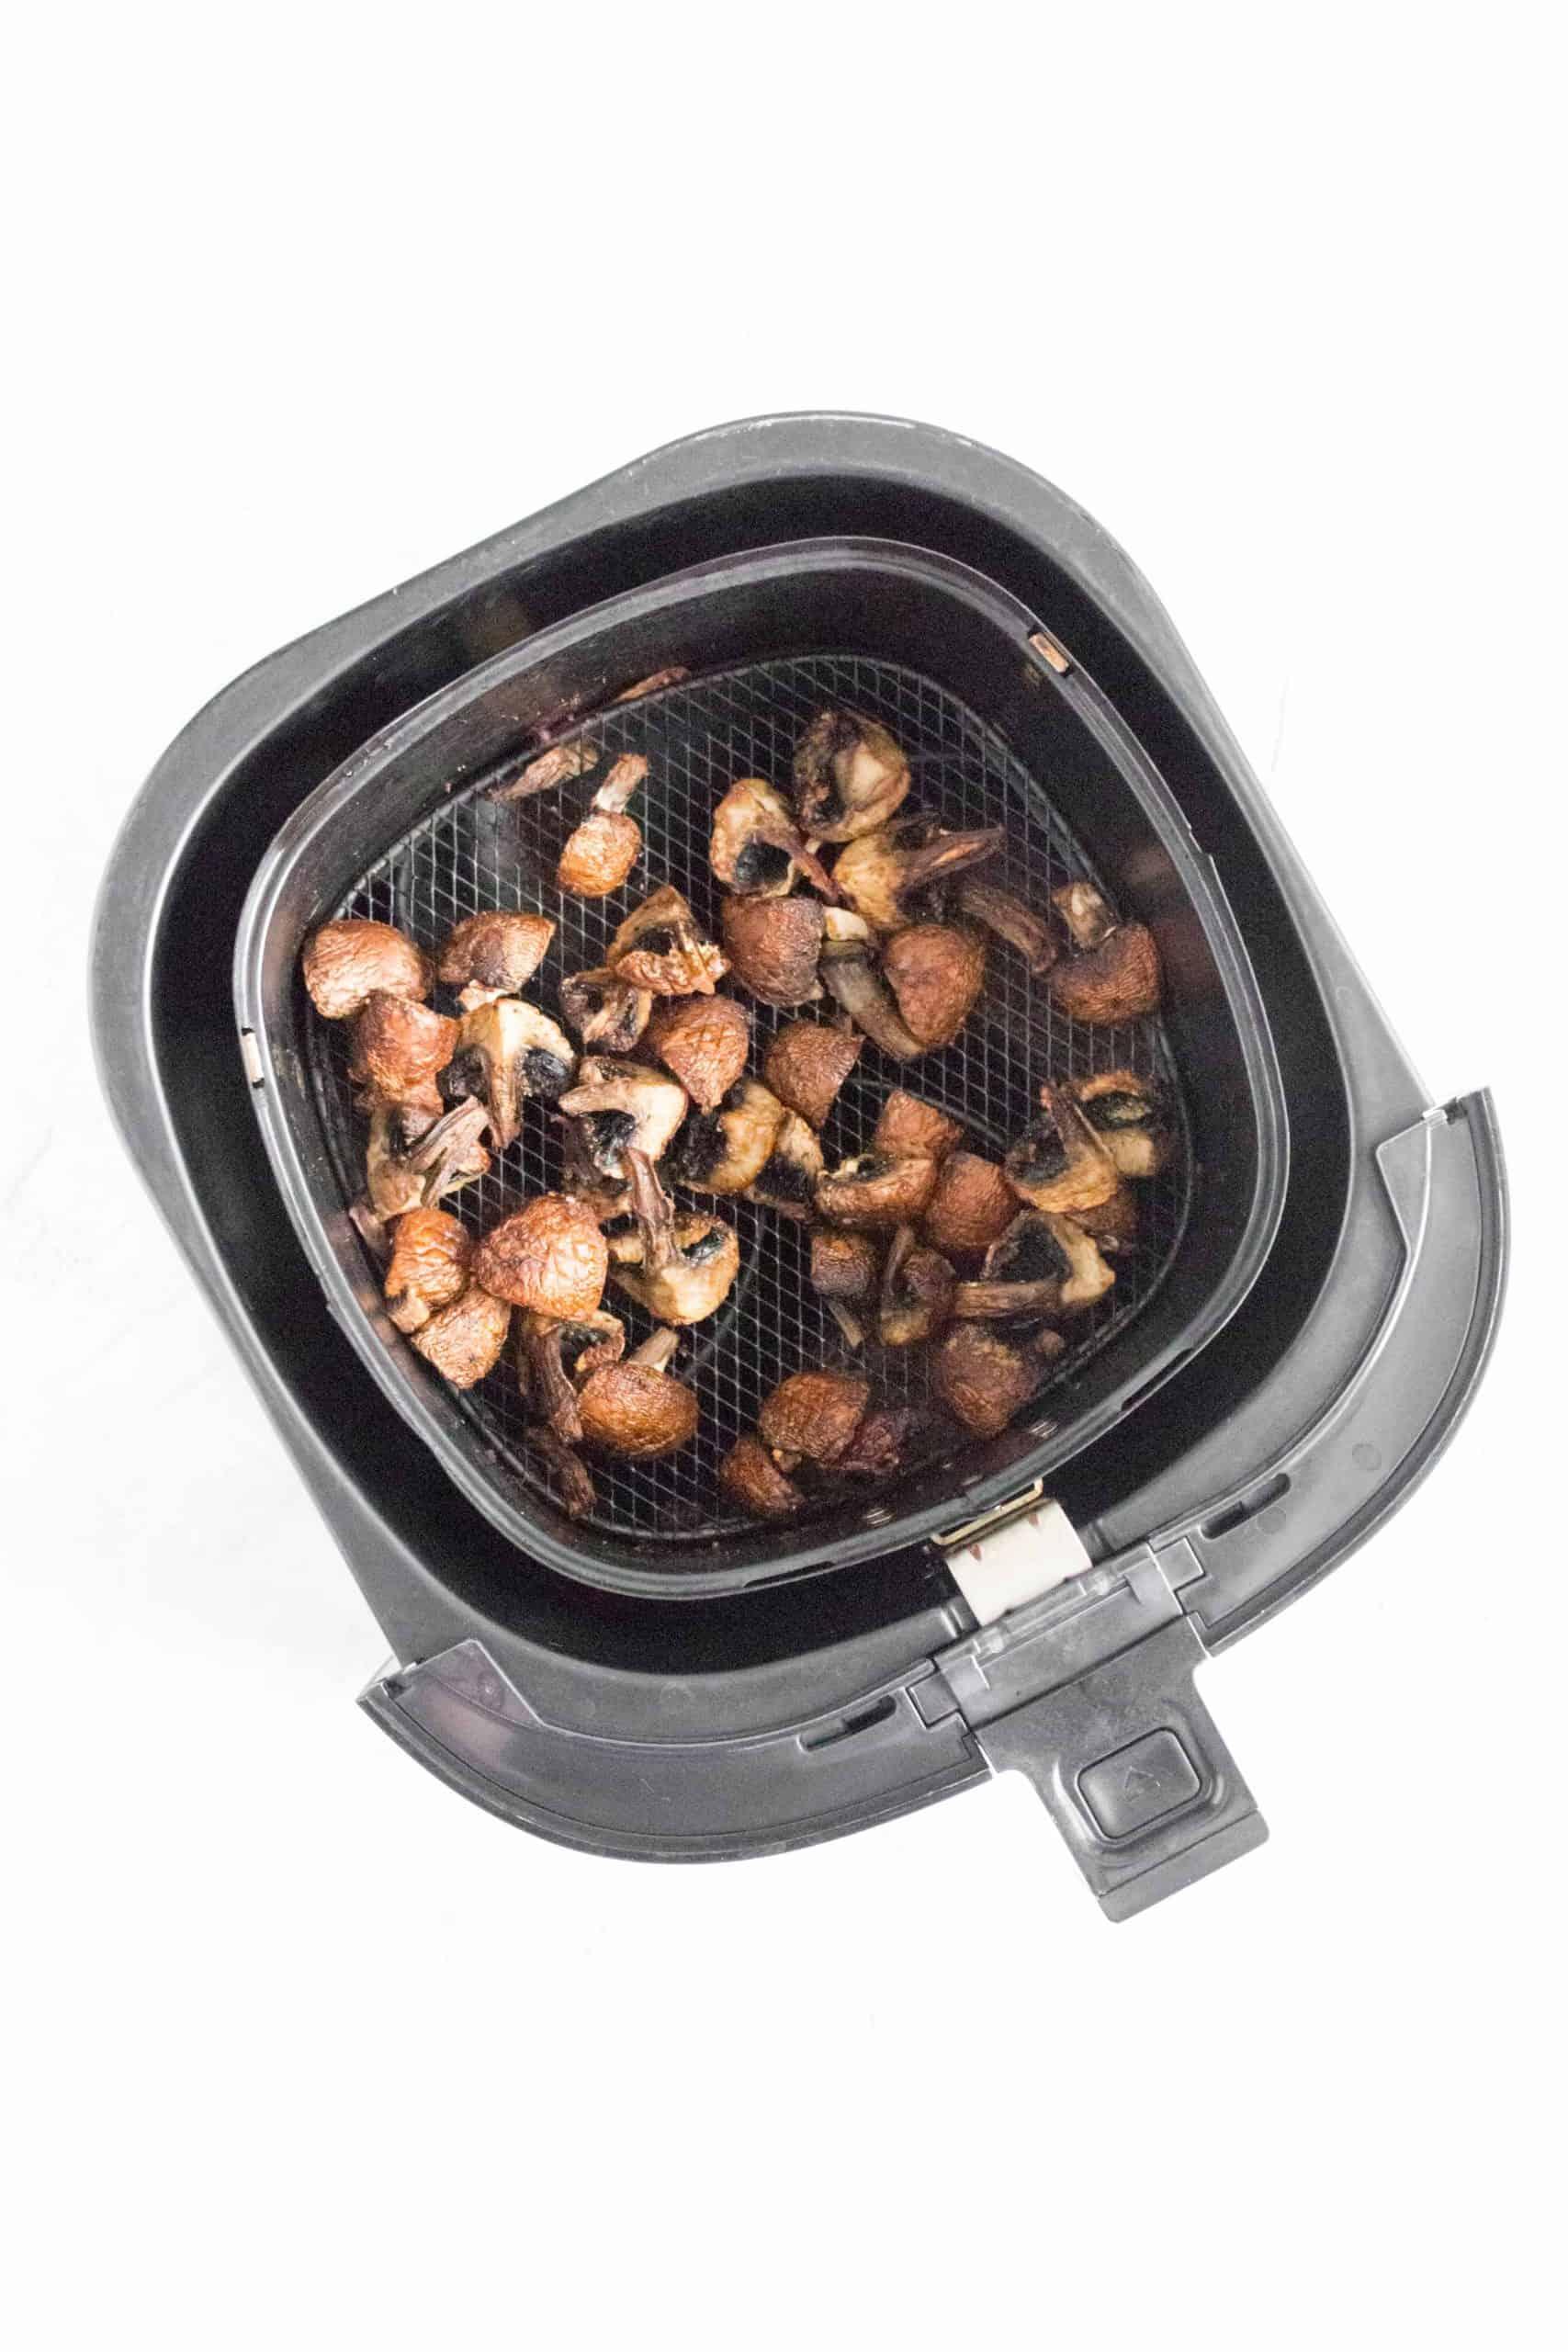 How To Roast Mushrooms in the Air Fryer